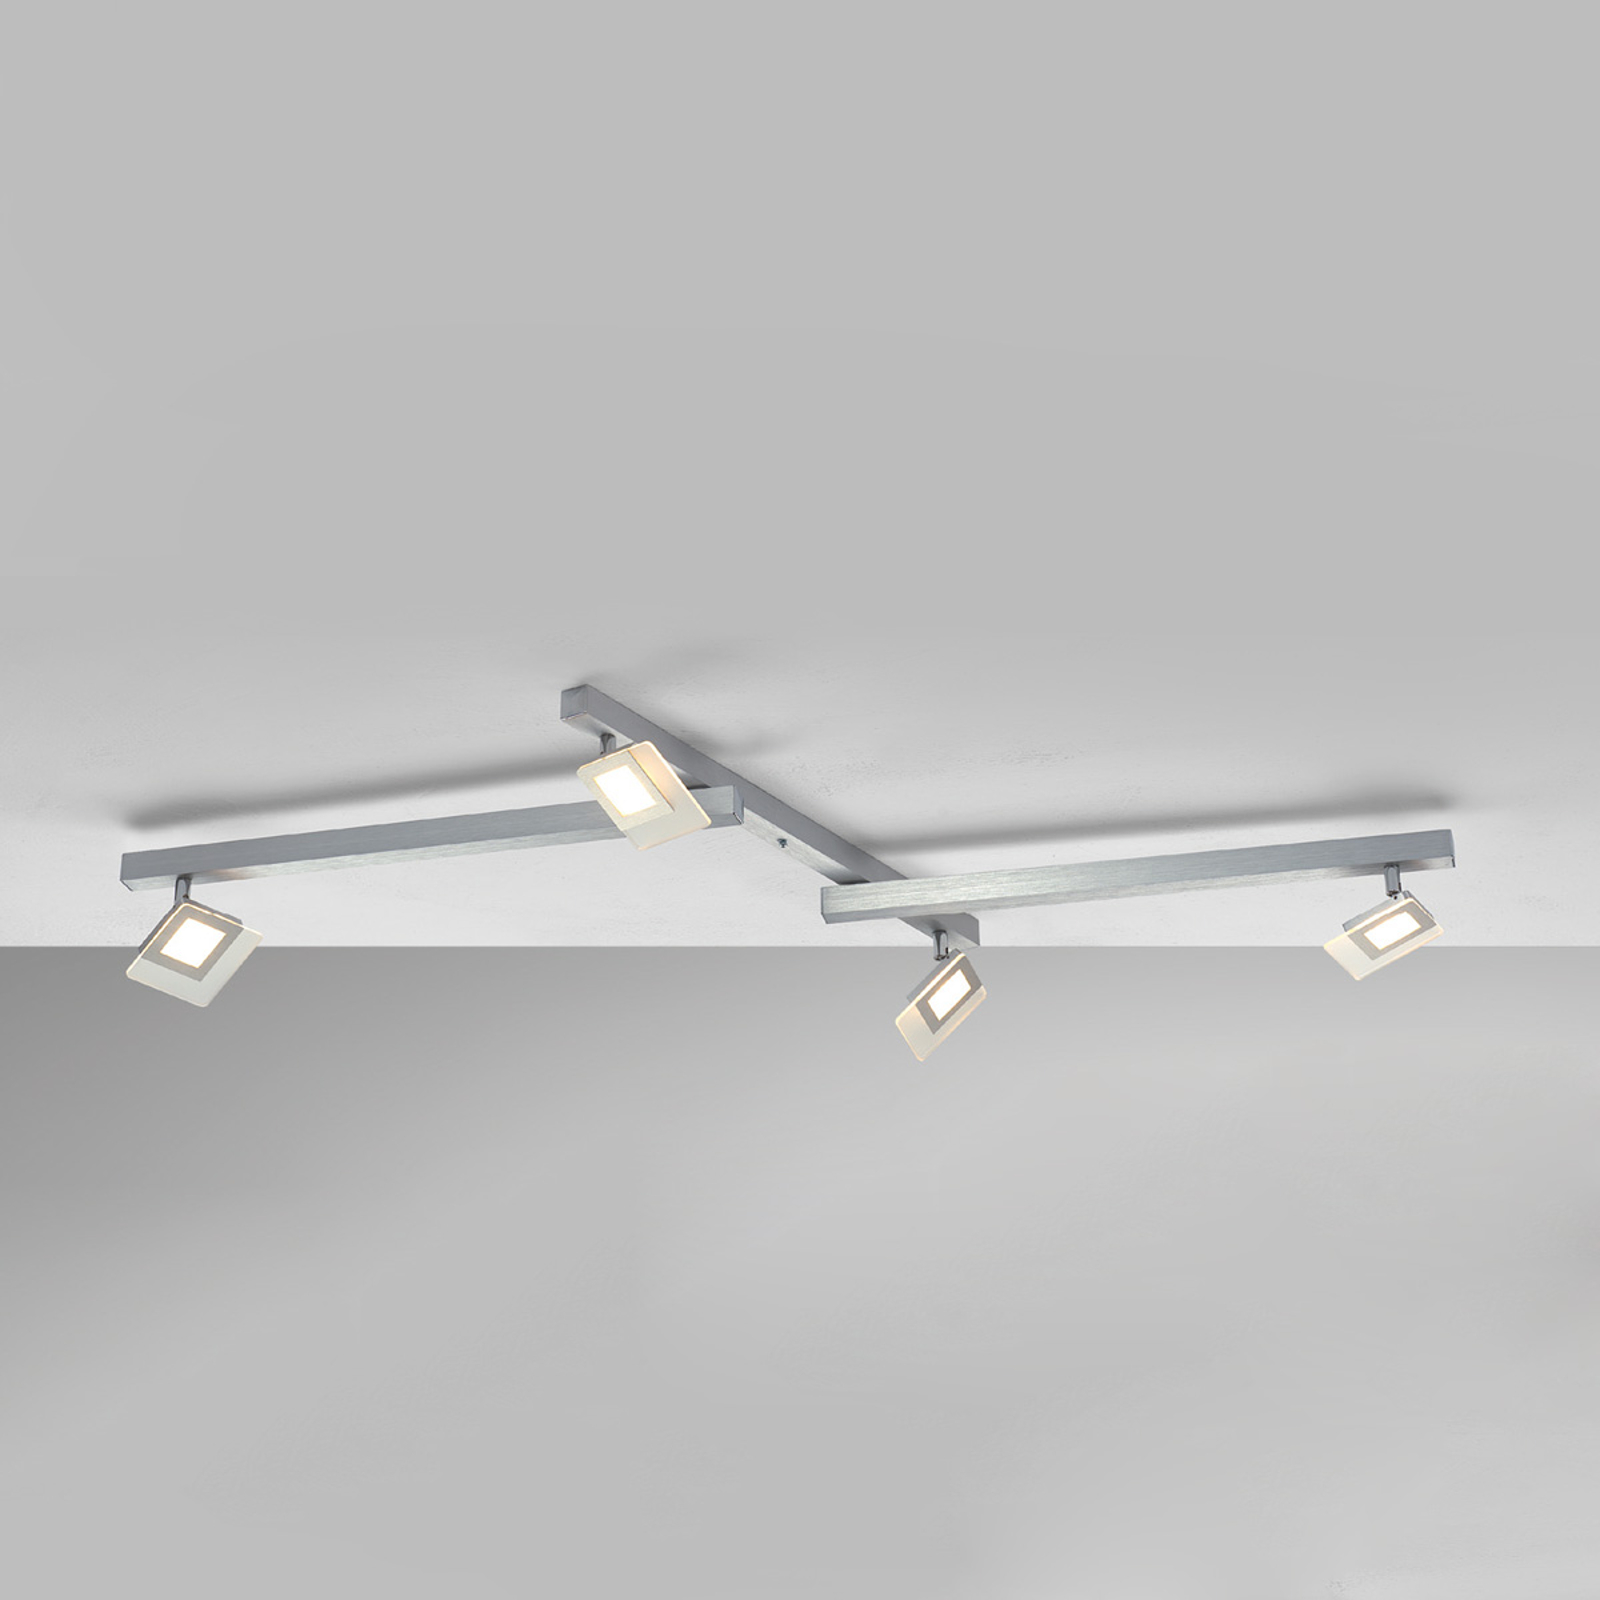 Eksklusiv LED-loftslampe Line, 4 lyskilder